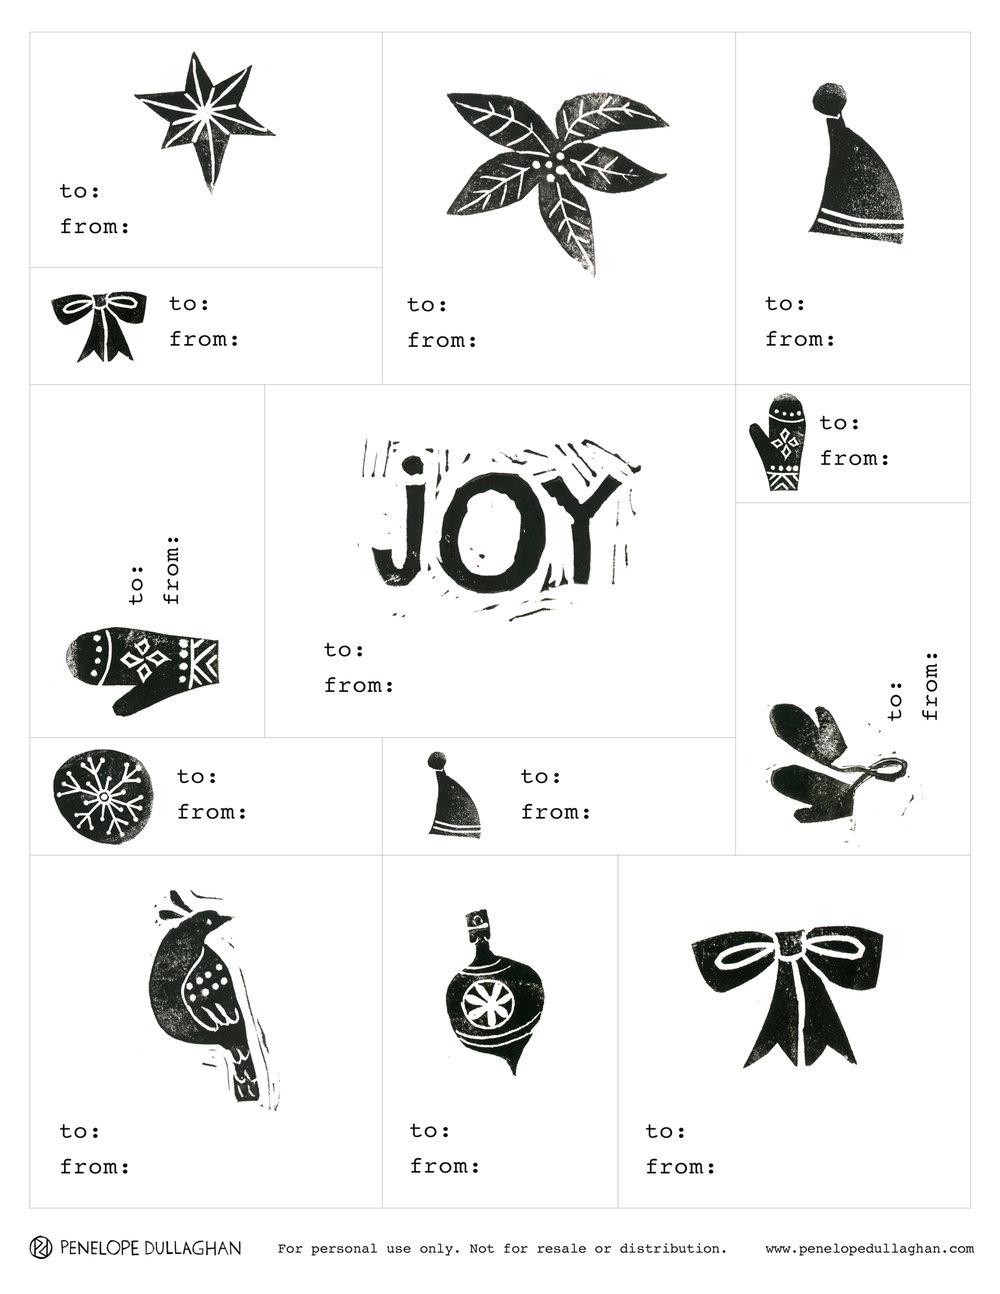 block print gift tags - free printable from illustrator Penelope Dullaghan  sc 1 st  Penelope Dullaghan & block printed gift tags - printable download for you! u2014 Penelope ...